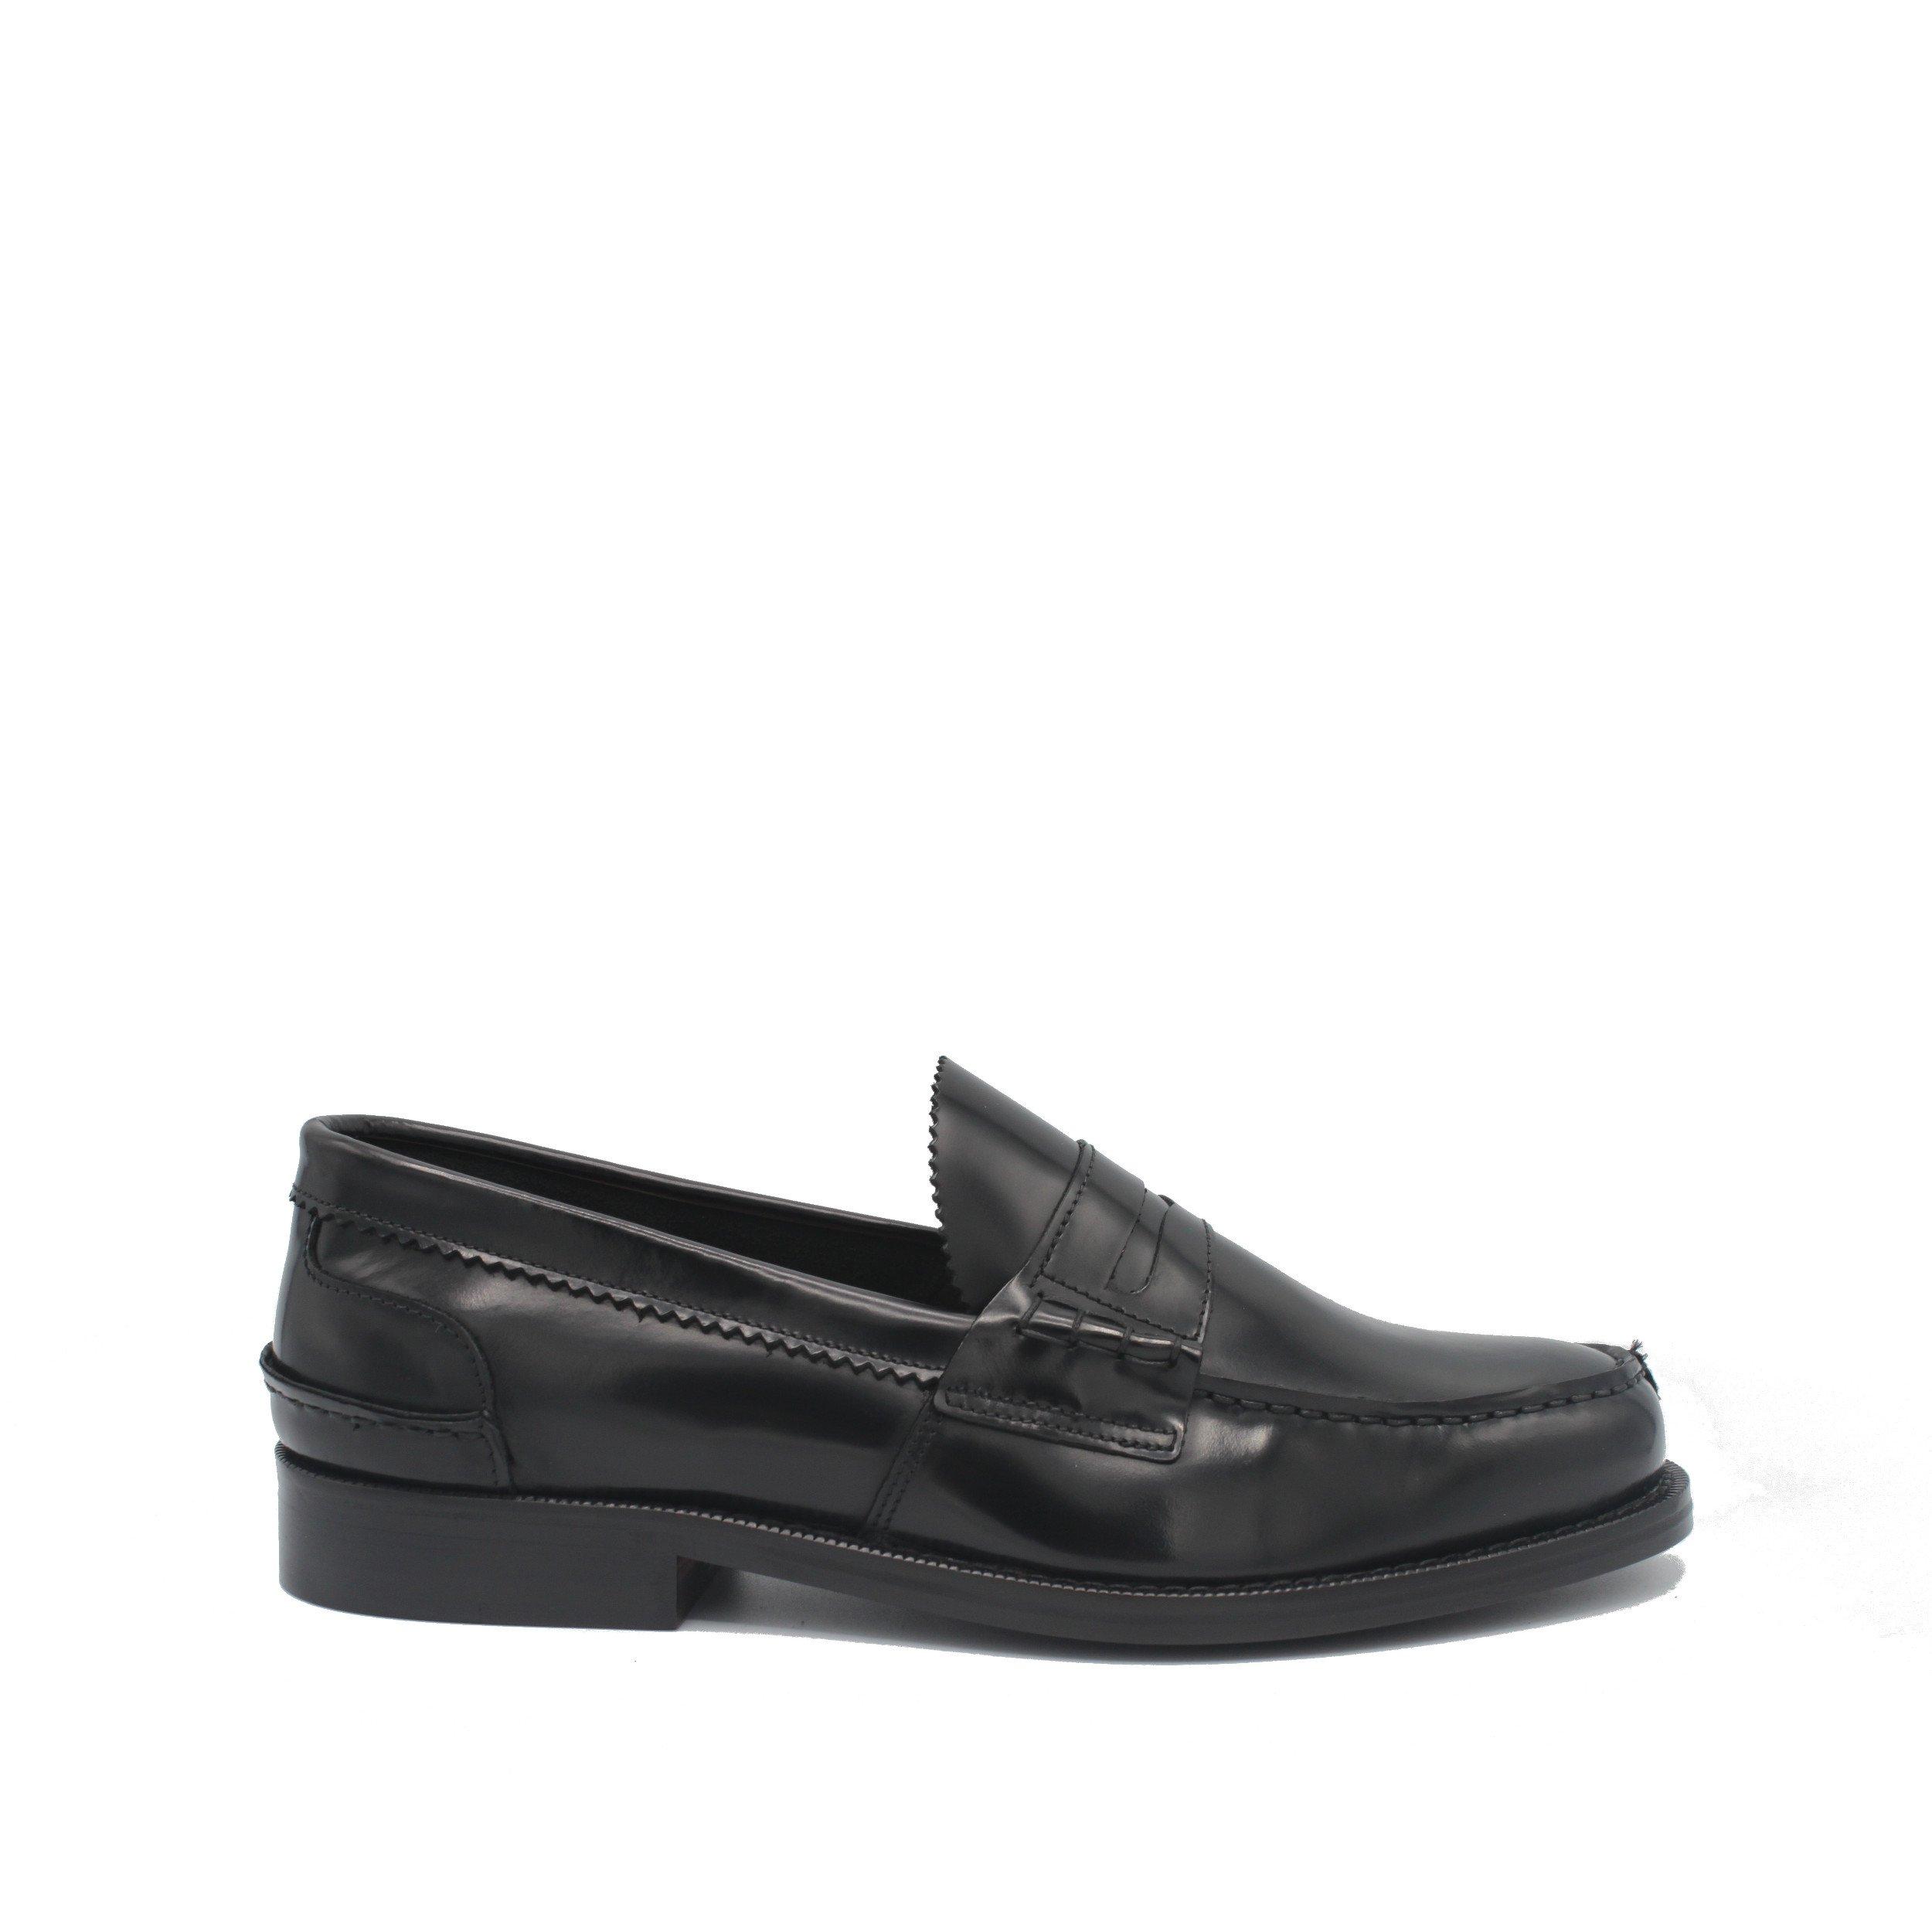 Saxone of Scotland Men's Spazzolato Leather Loafer Black 1000_Black - EU45/US12